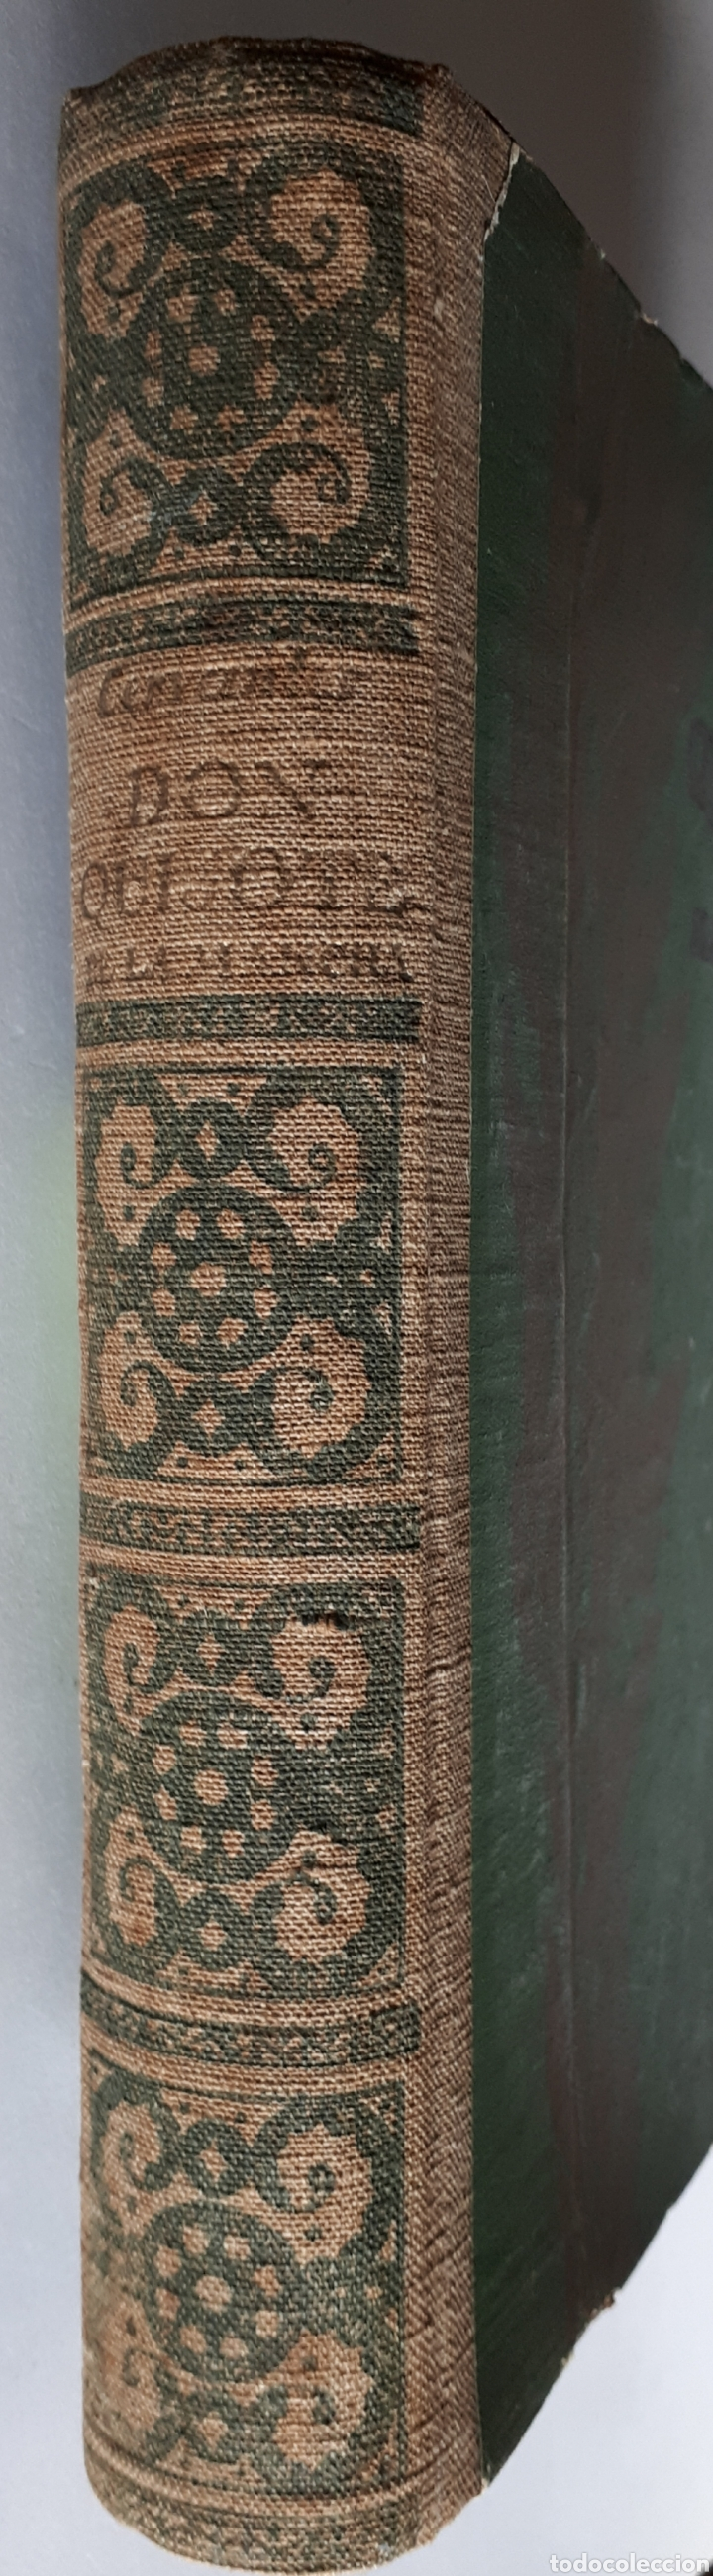 Libros antiguos: DON QUIJOTE DE LA MANCHA. ED. SATURNINO CALLEJA S.A. - Foto 3 - 211783832